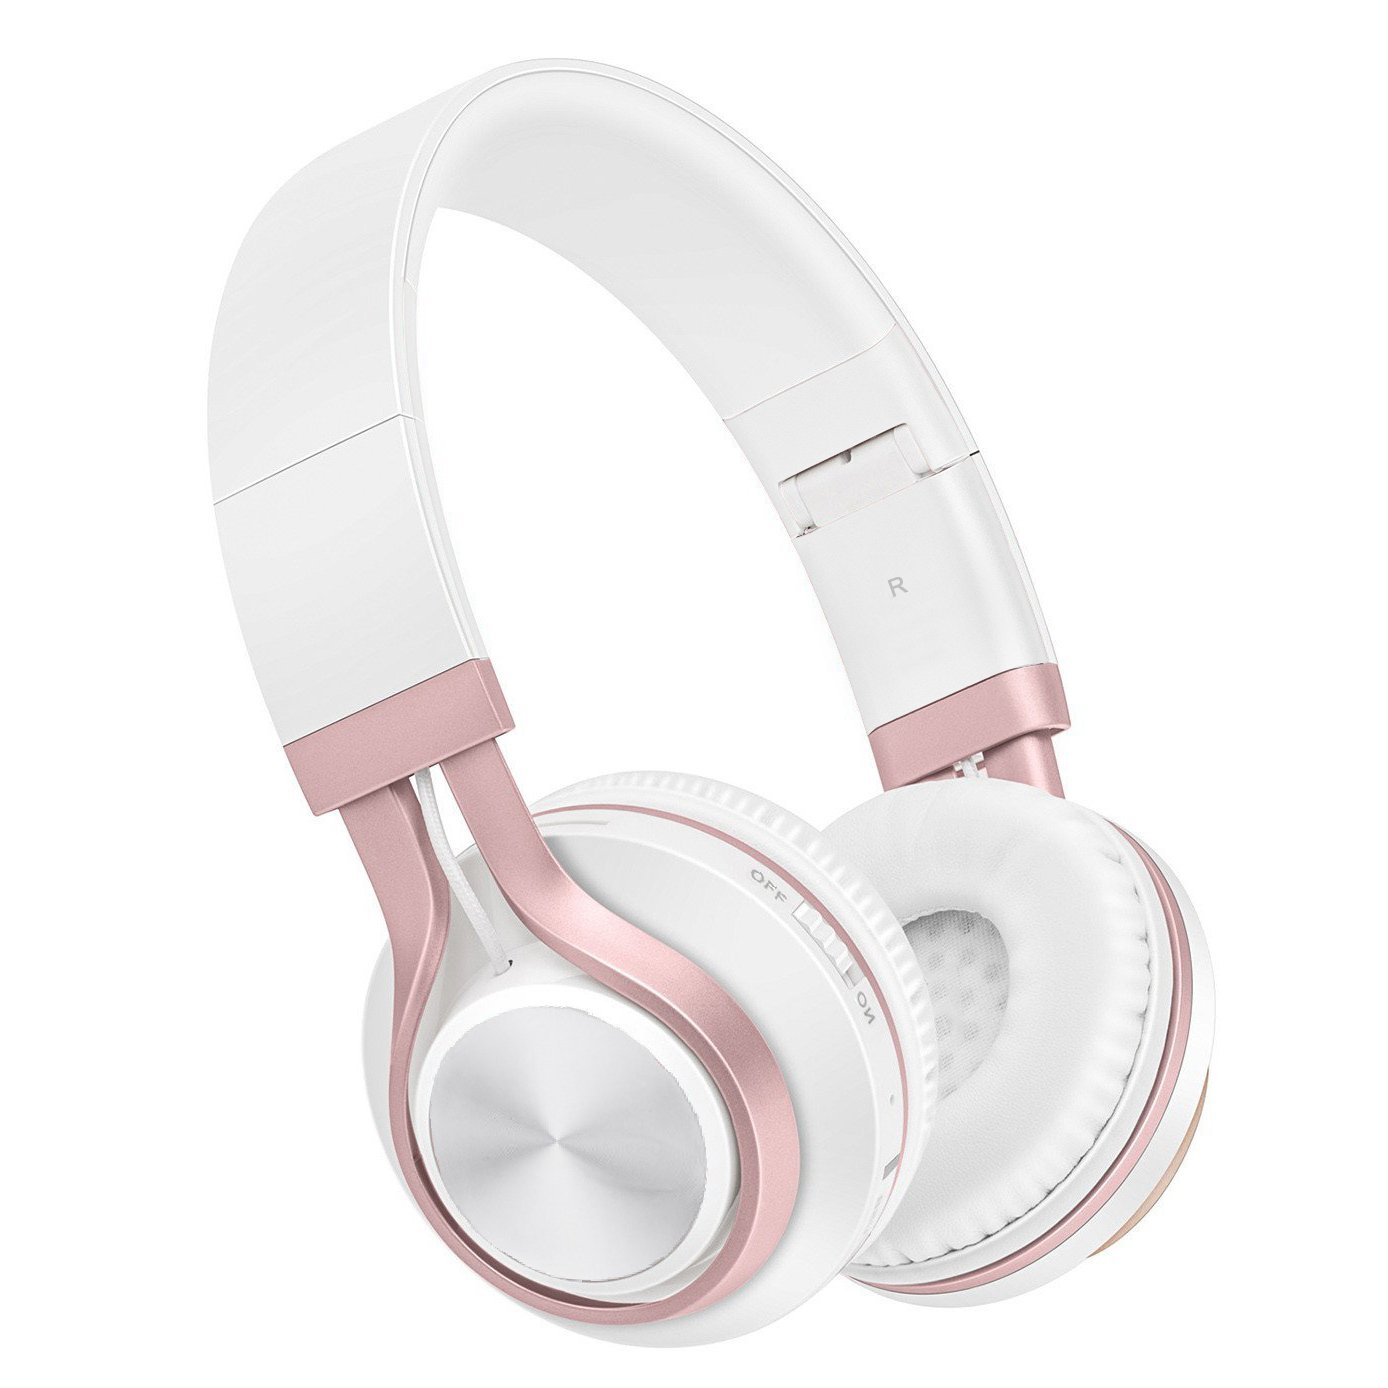 Auriculares Baseman Plegable Inalambrico Bluetooth V4.1 Over-ear Hi-fi Stereo Earphones Headsets Con Microfono Y Con Cab